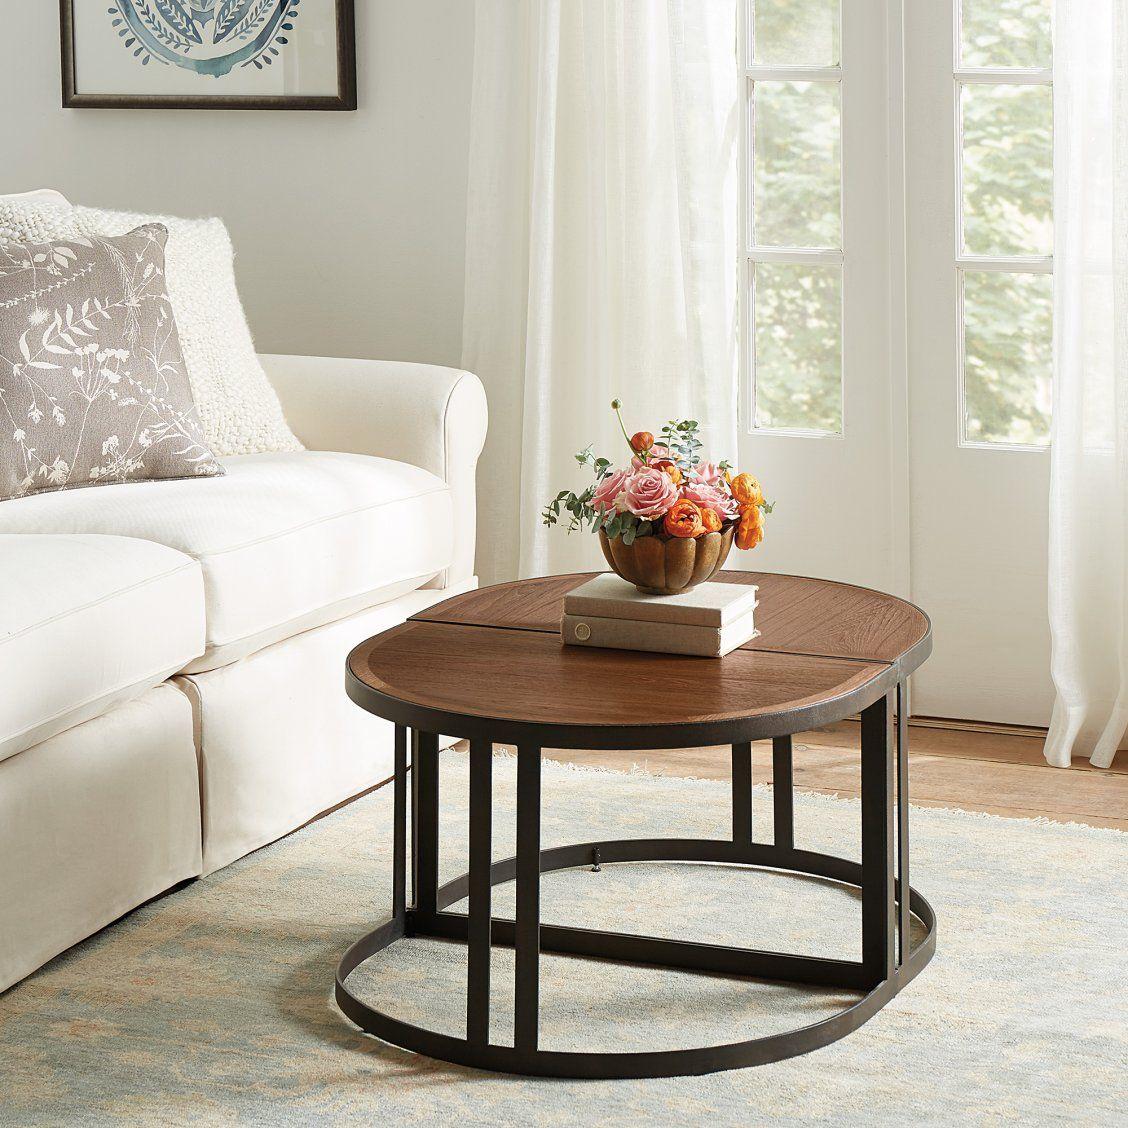 Alex Half Round Modular Coffee Table Coffee Table Modular Coffee Table Round Coffee Table [ 1128 x 1128 Pixel ]